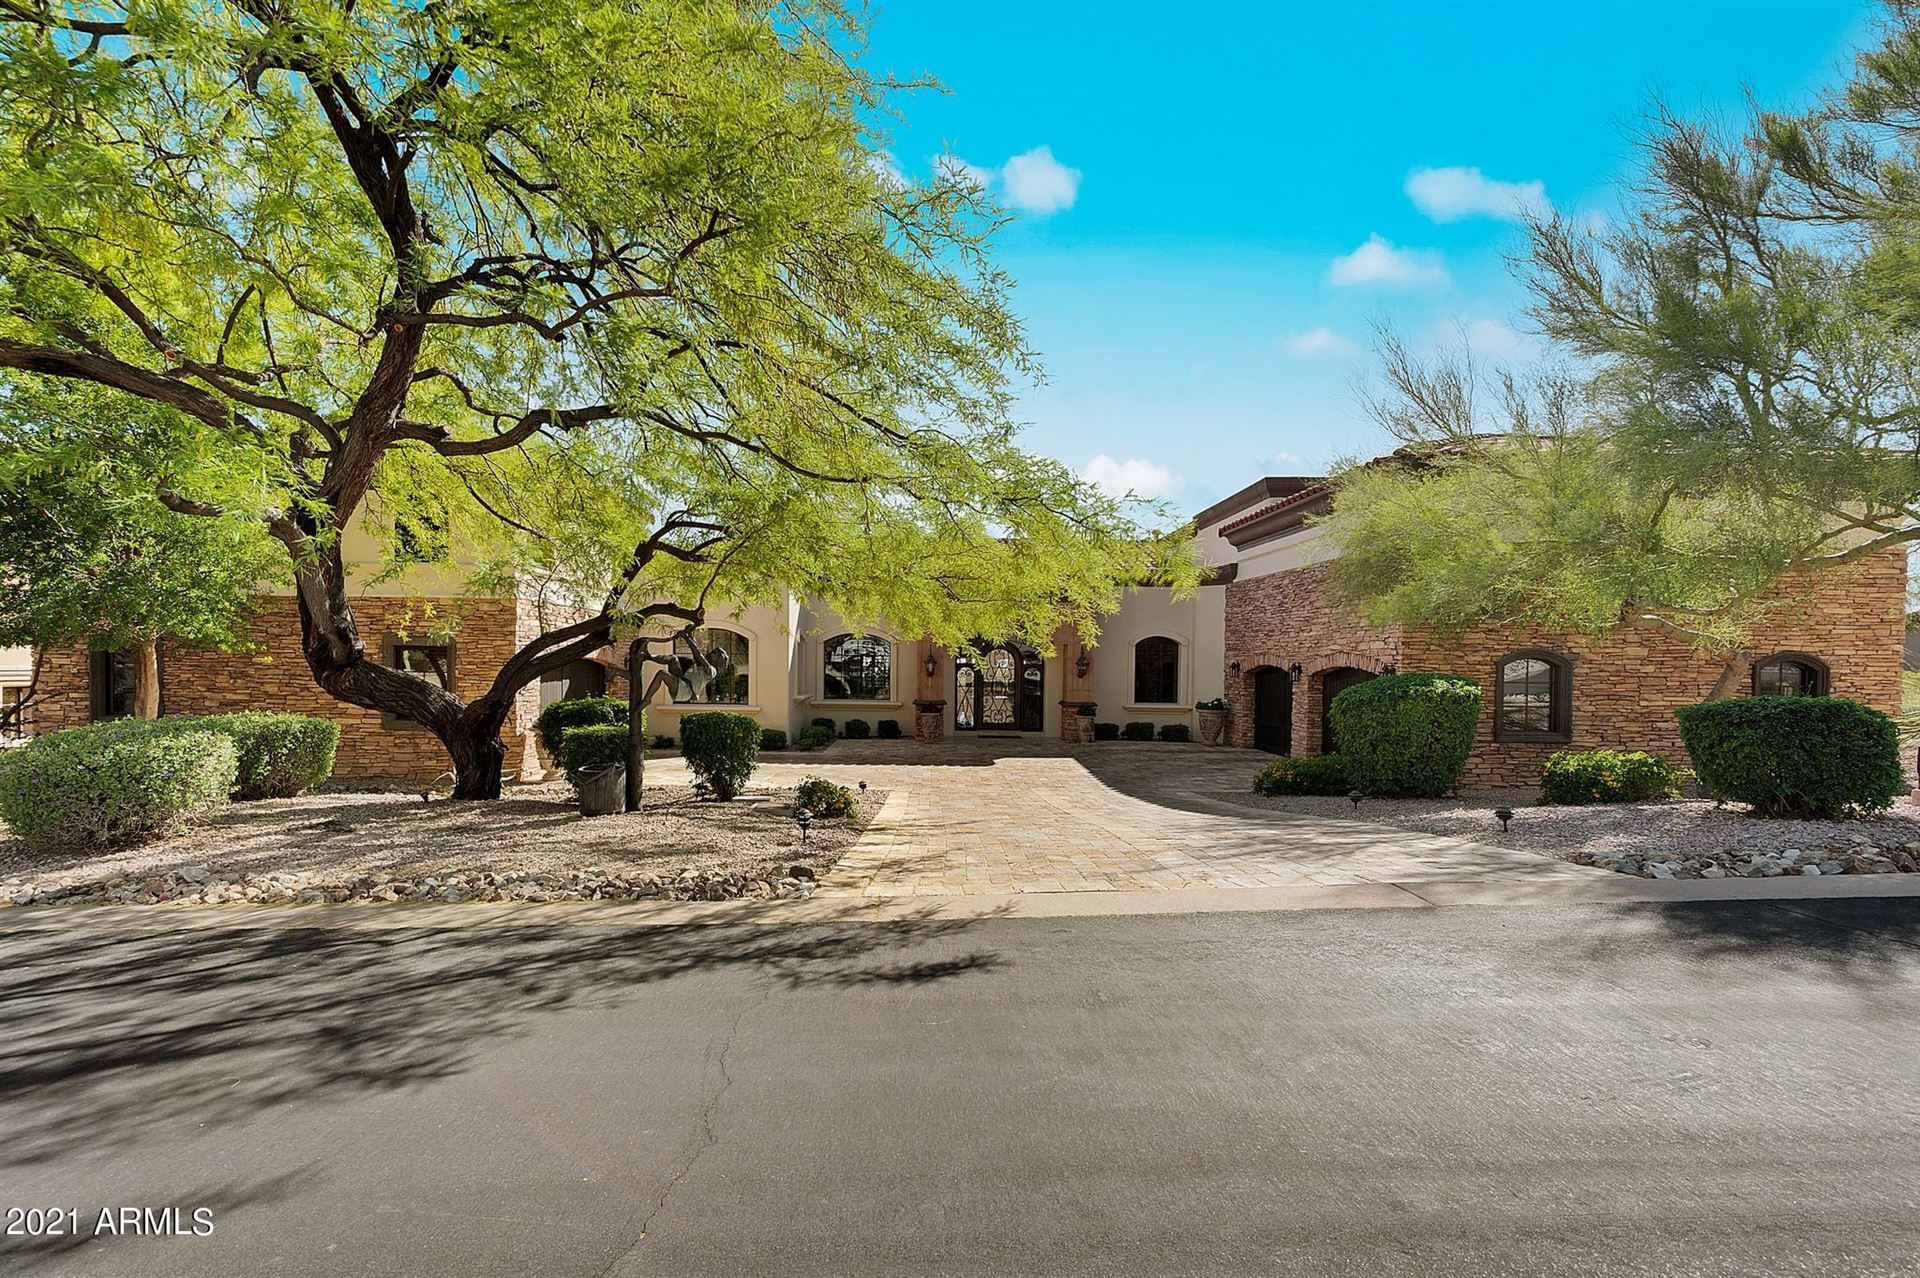 10721 E LA JUNTA Road, Scottsdale, AZ 85255 - MLS#: 6231559